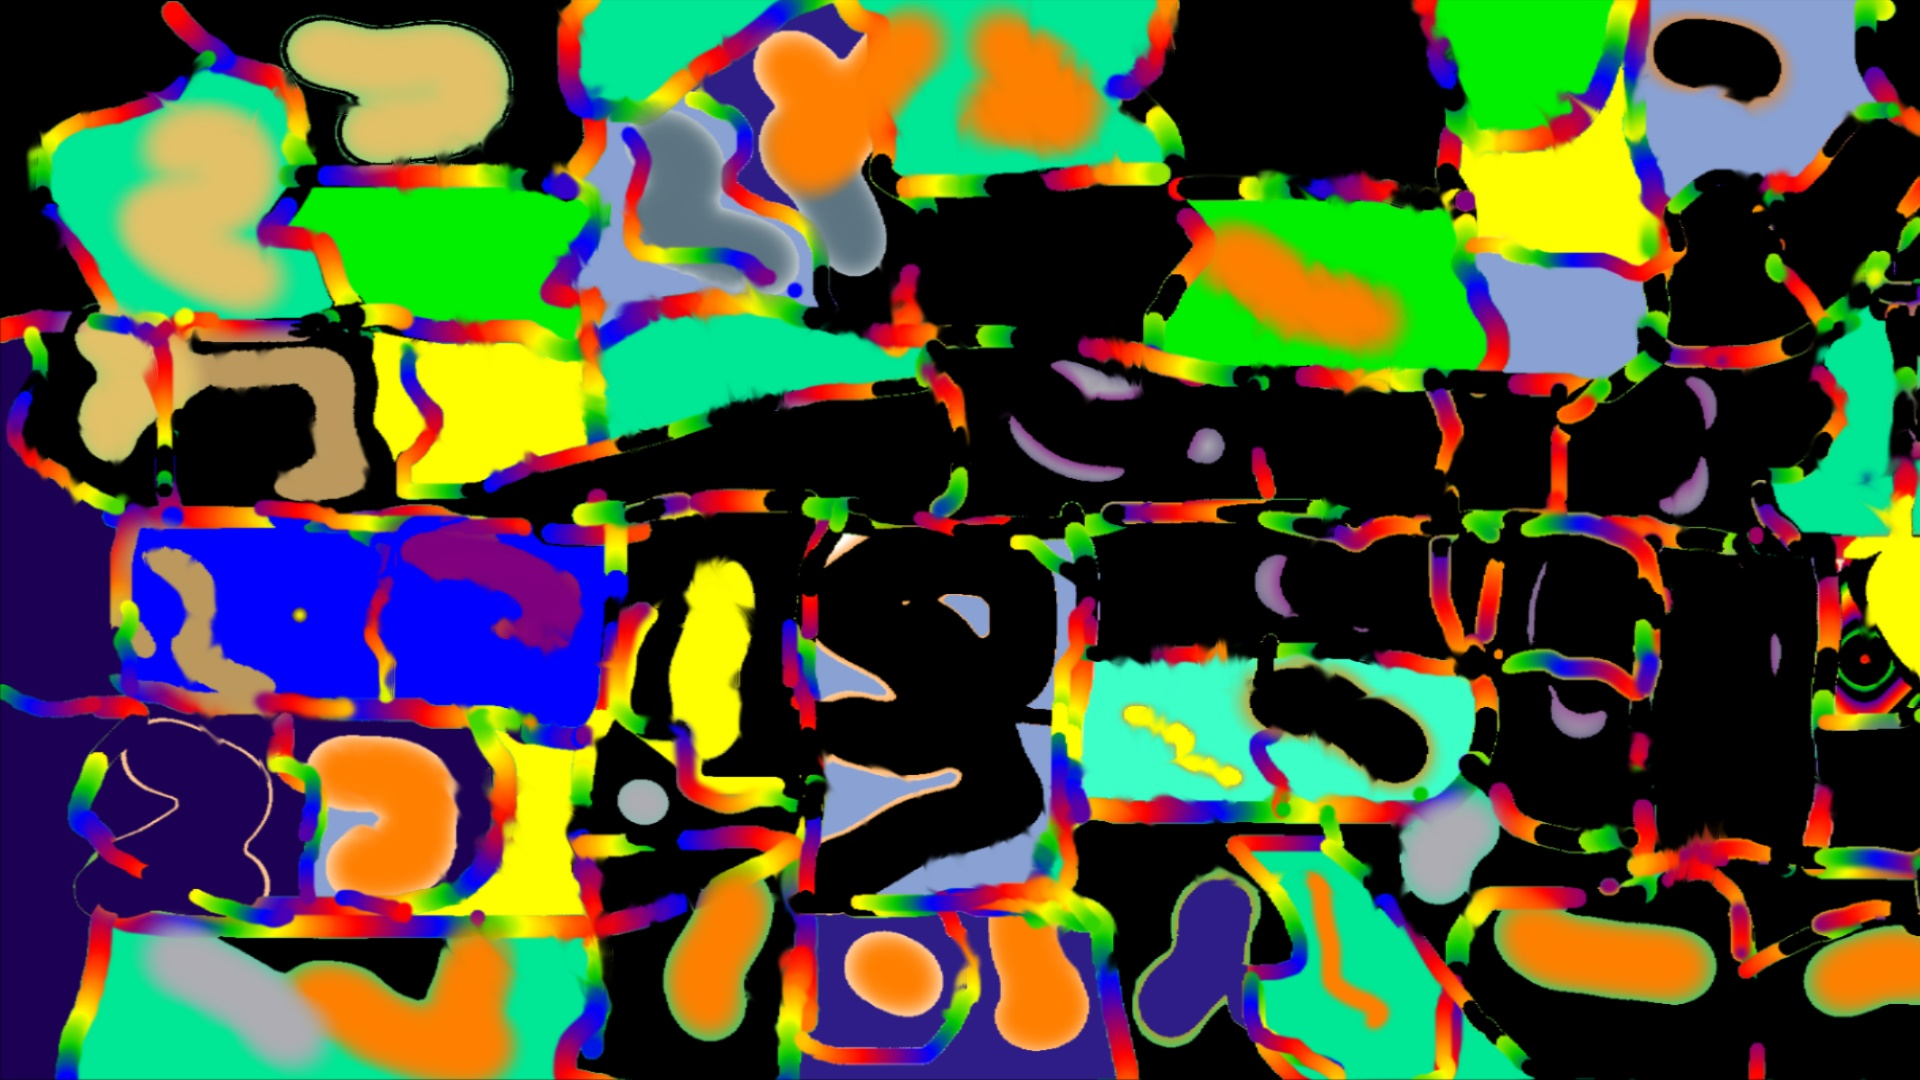 Abstraction Coloré Intence 2019 wallpaper